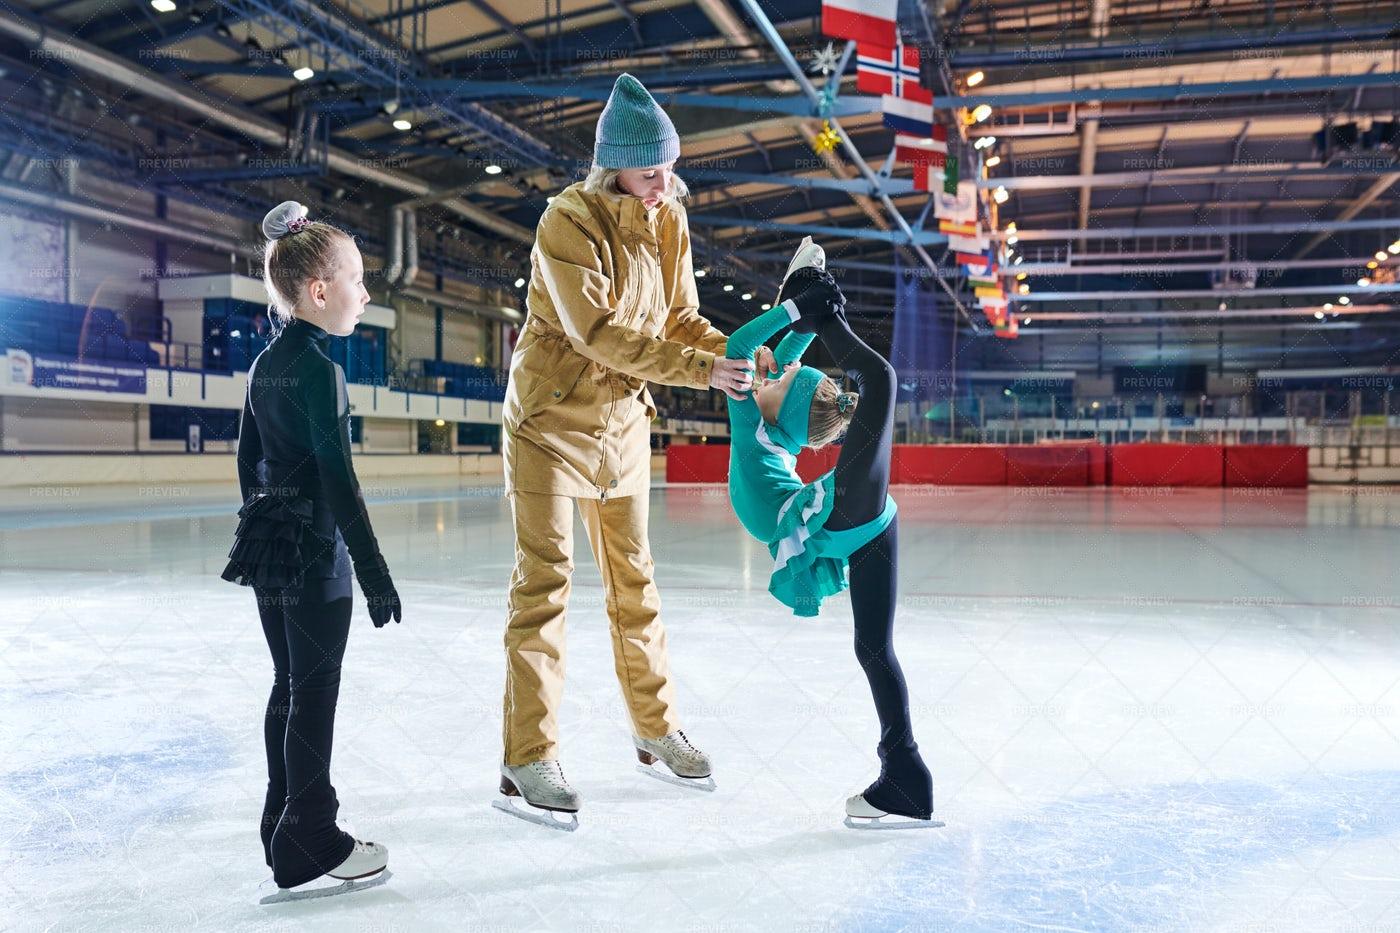 Training In Figure Skating: Stock Photos